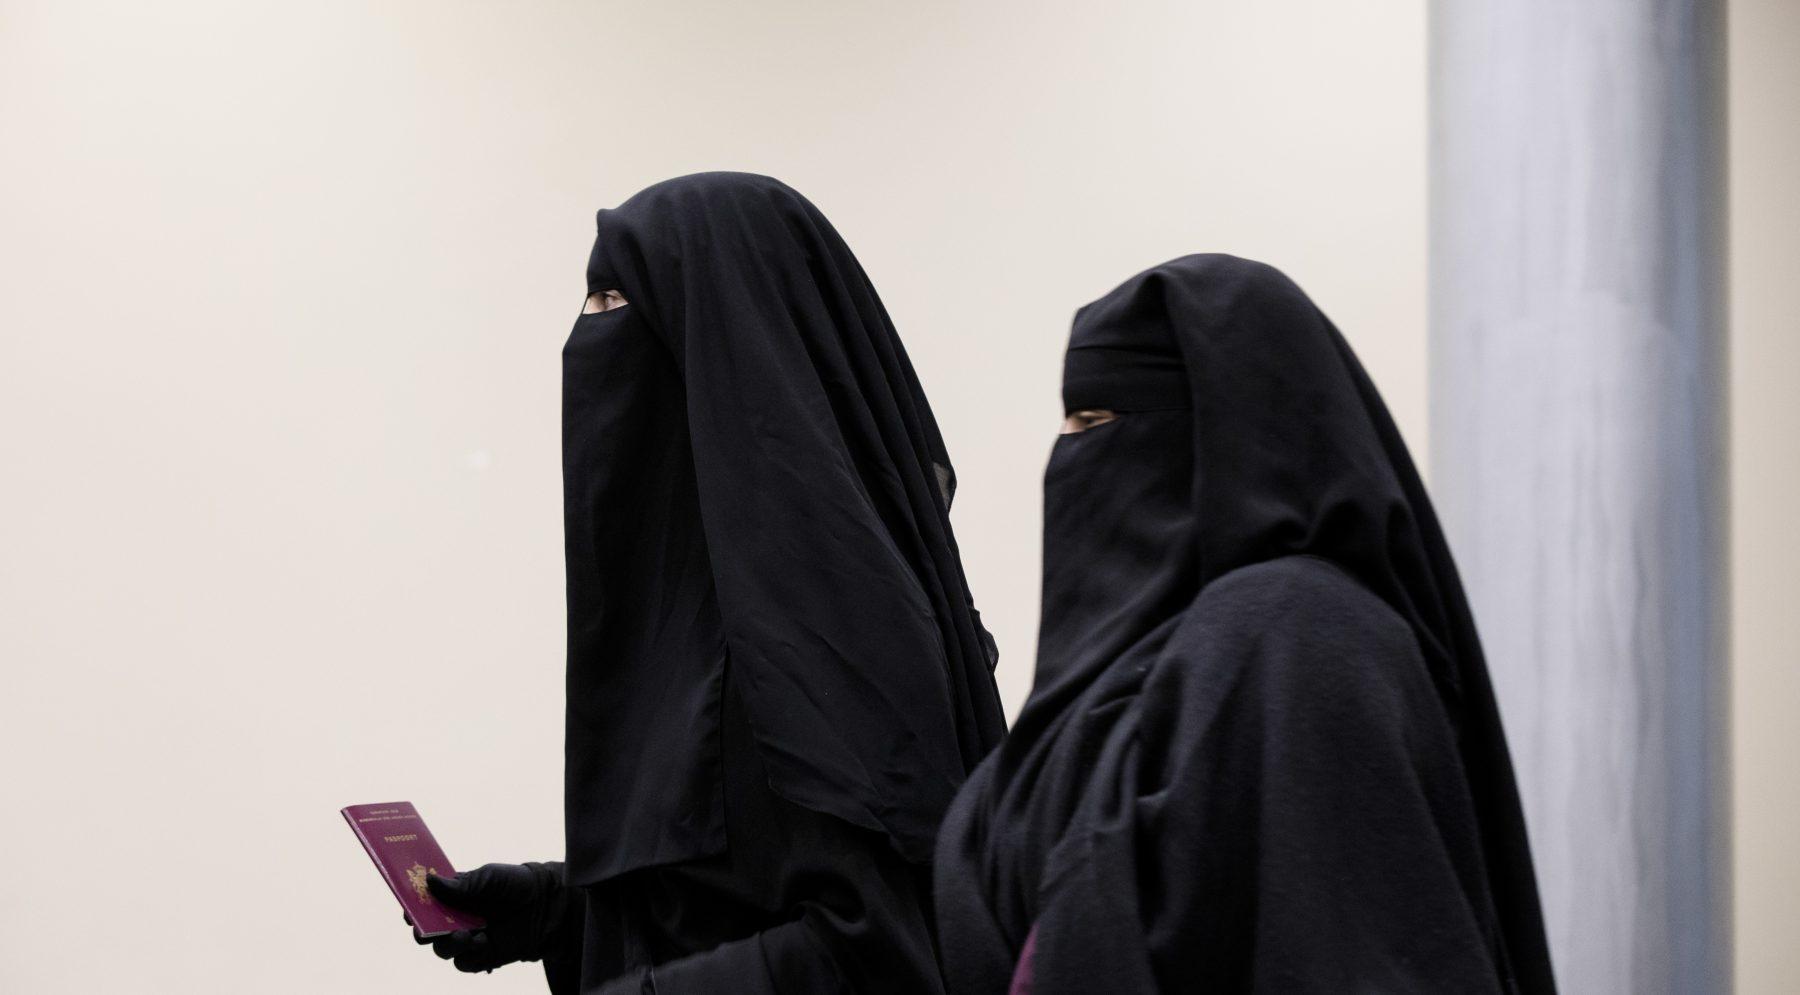 Femke Halsema: 'Amsterdam gaat boerkaverbod niet handhaven'